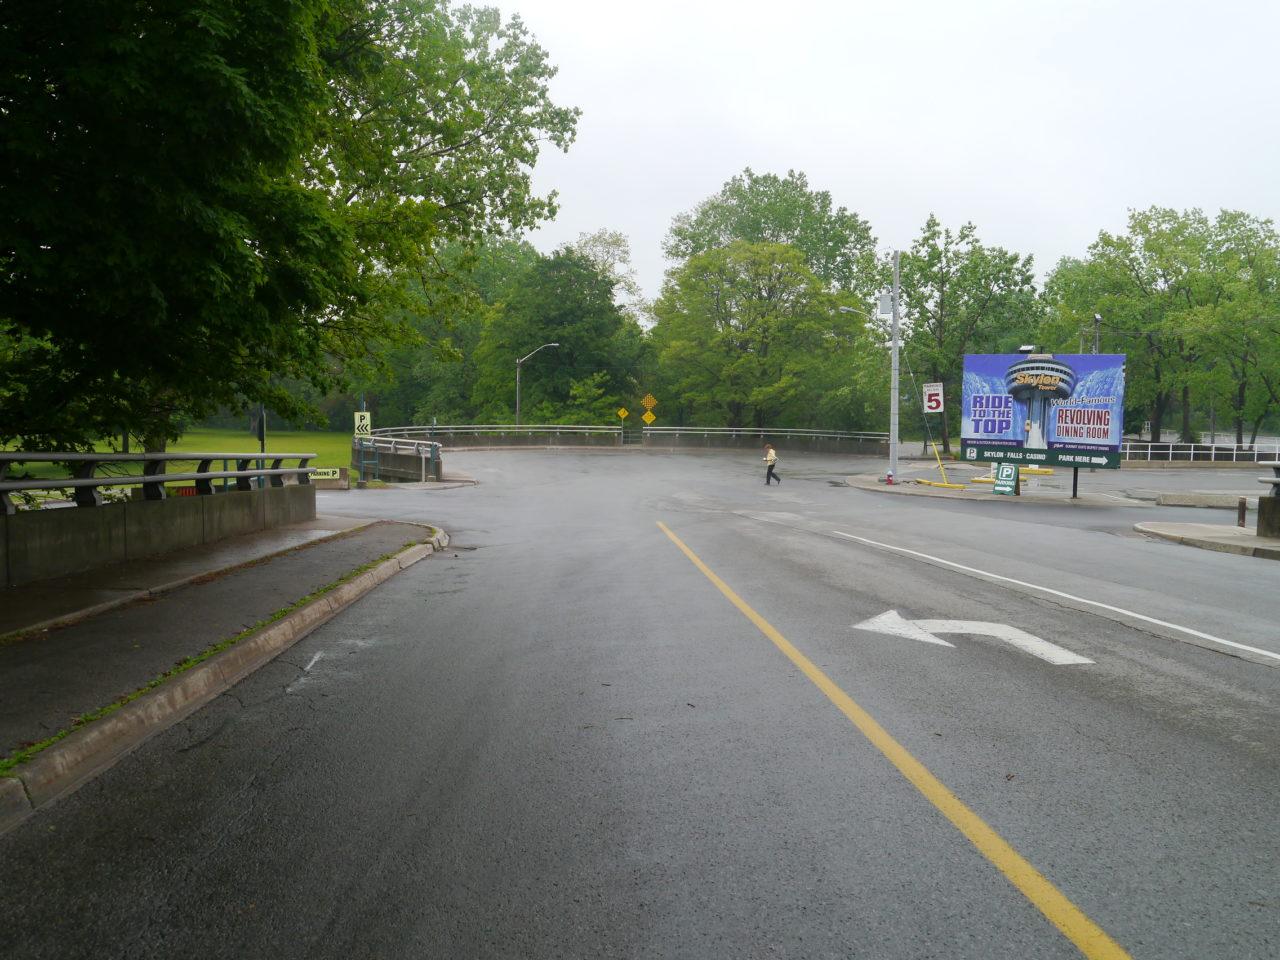 Niagara Falls parking lot